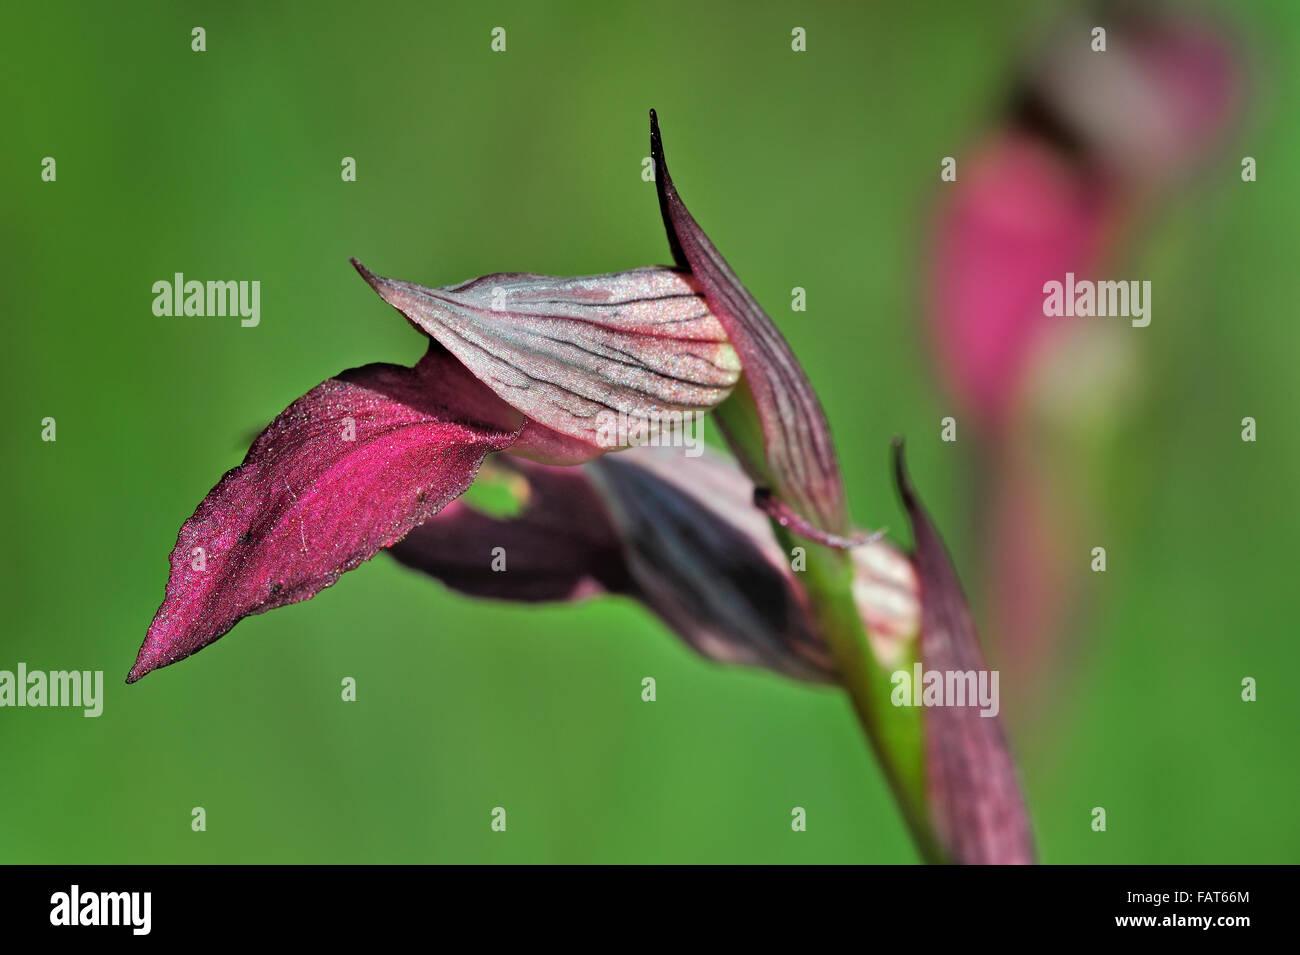 Tongue orchid / Tongue Serapias (Serapias lingua / Helleborine lingua / Orchis lingua) in flower - Stock Image